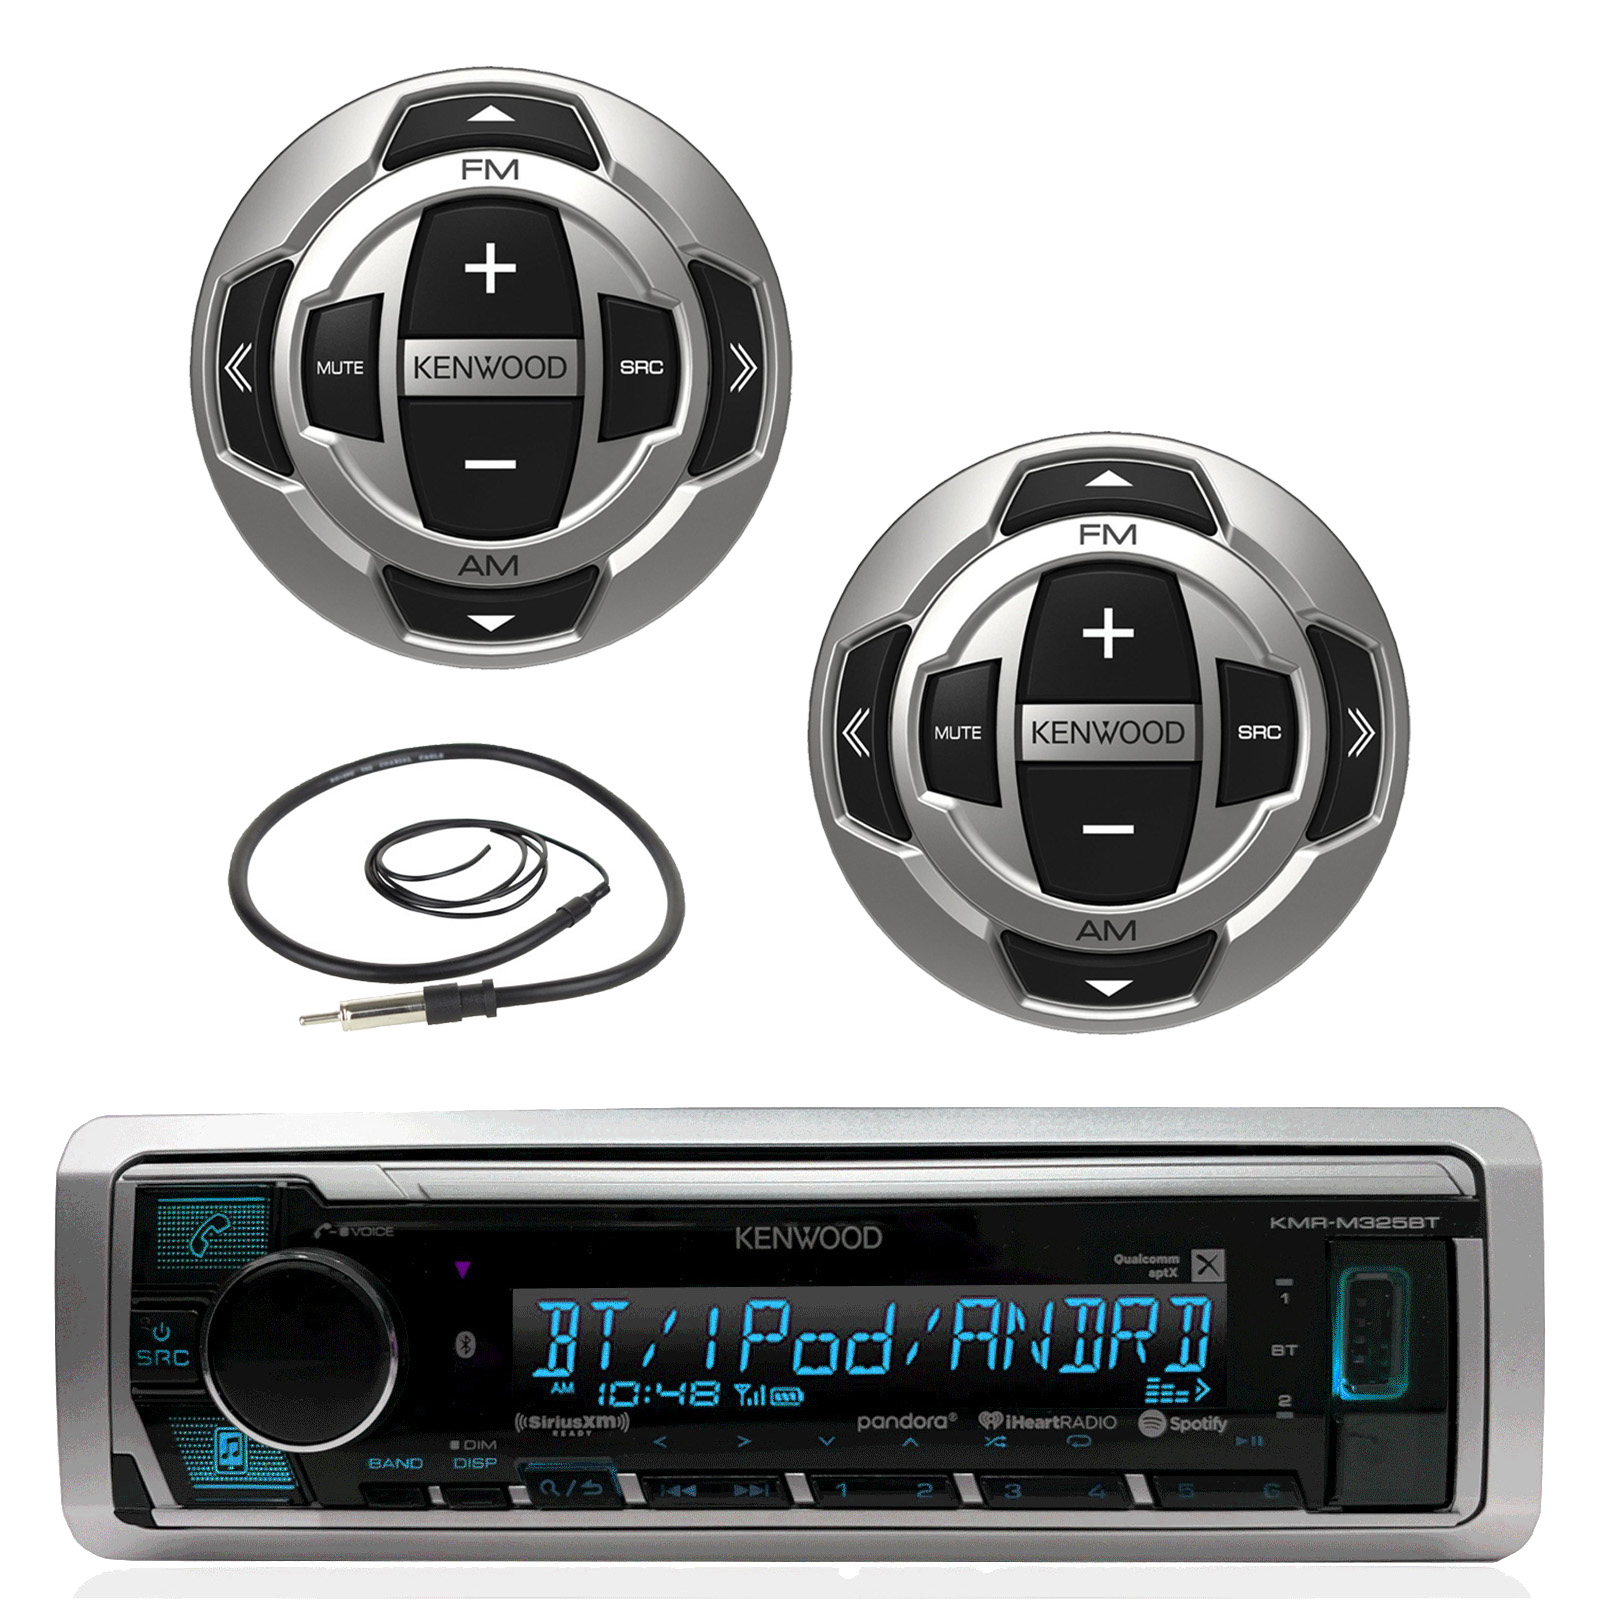 "Kenwood Marine Boat Yacht Digital Media USB AUX Bluetooth Stereo Receiver (No CD), 2x Kenwood Wired Remote, 22"" Enrock AM/FM Antenna"